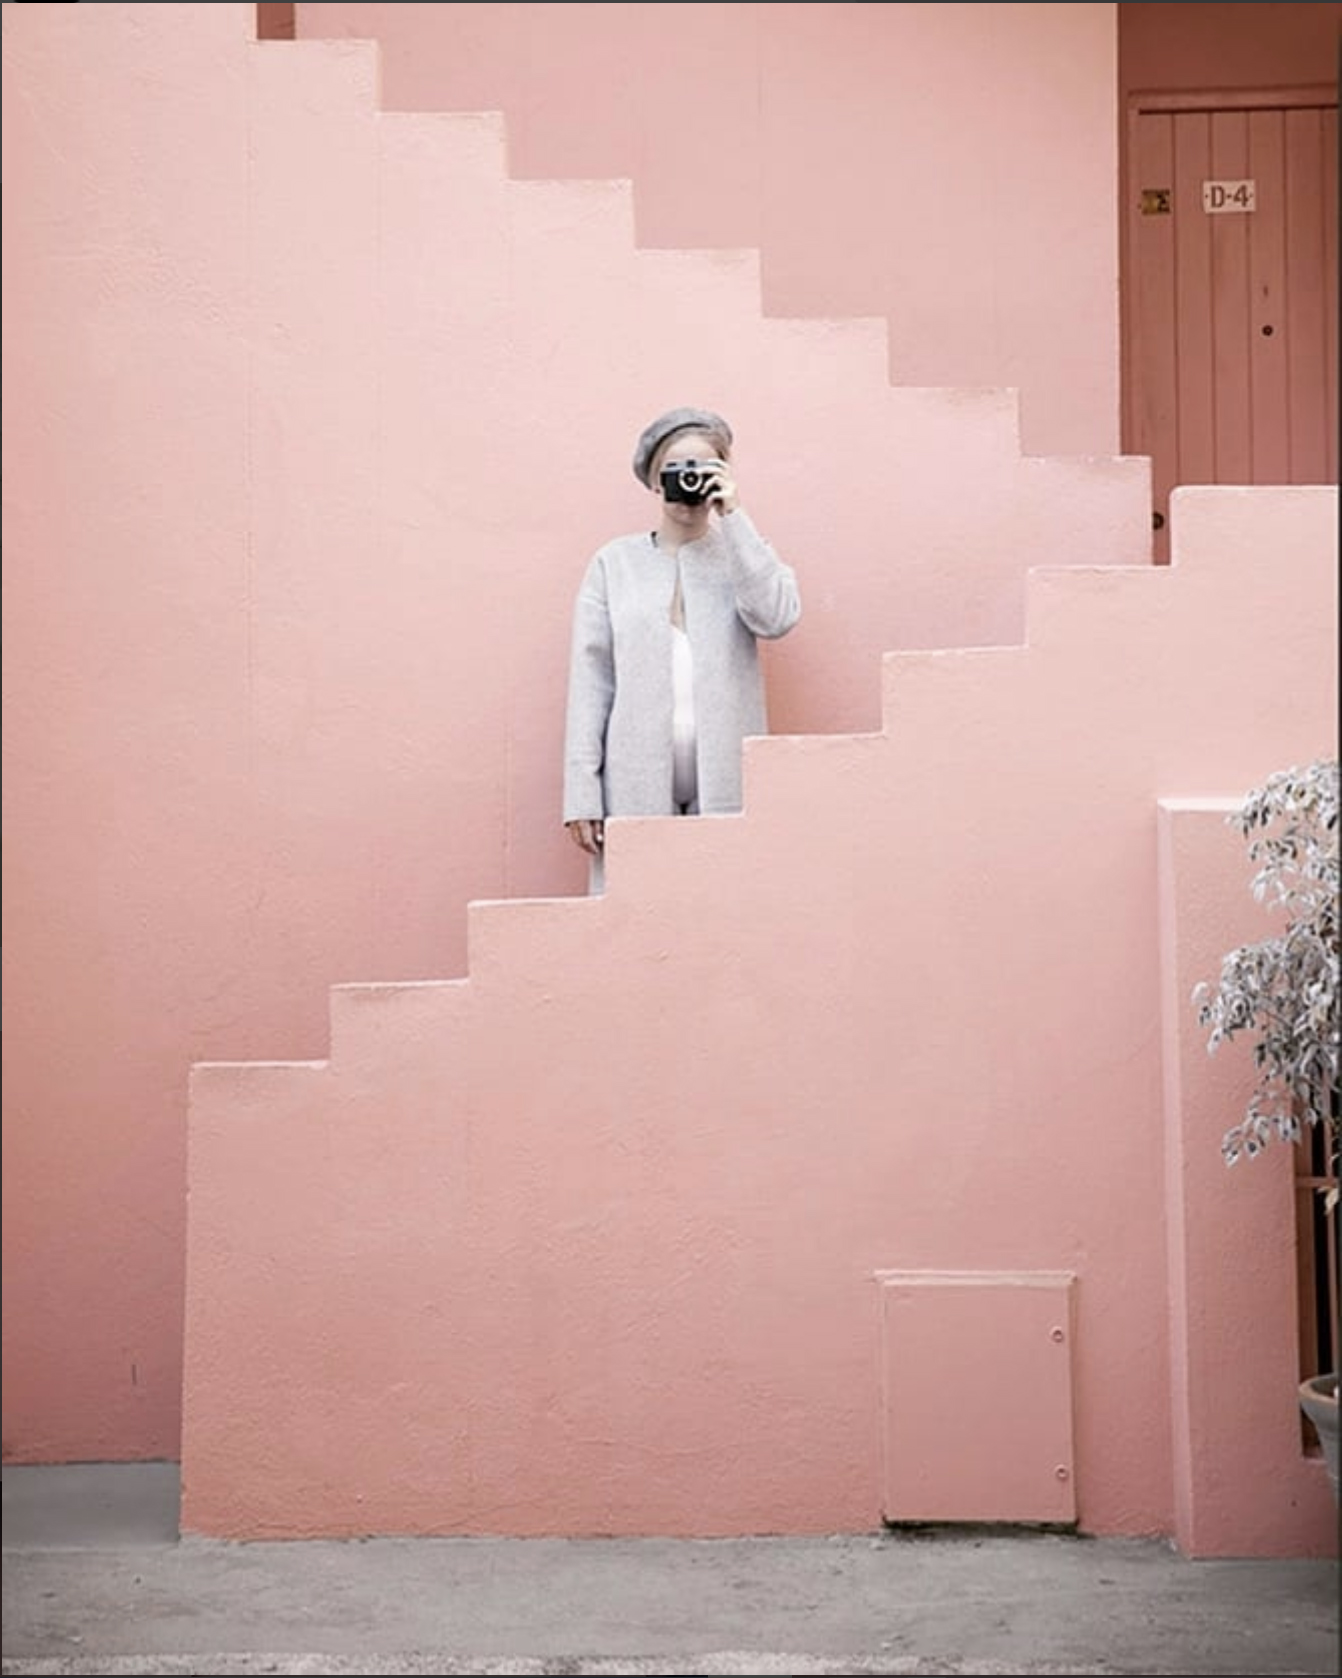 The Dreamy Illusions of Lara Zankoul